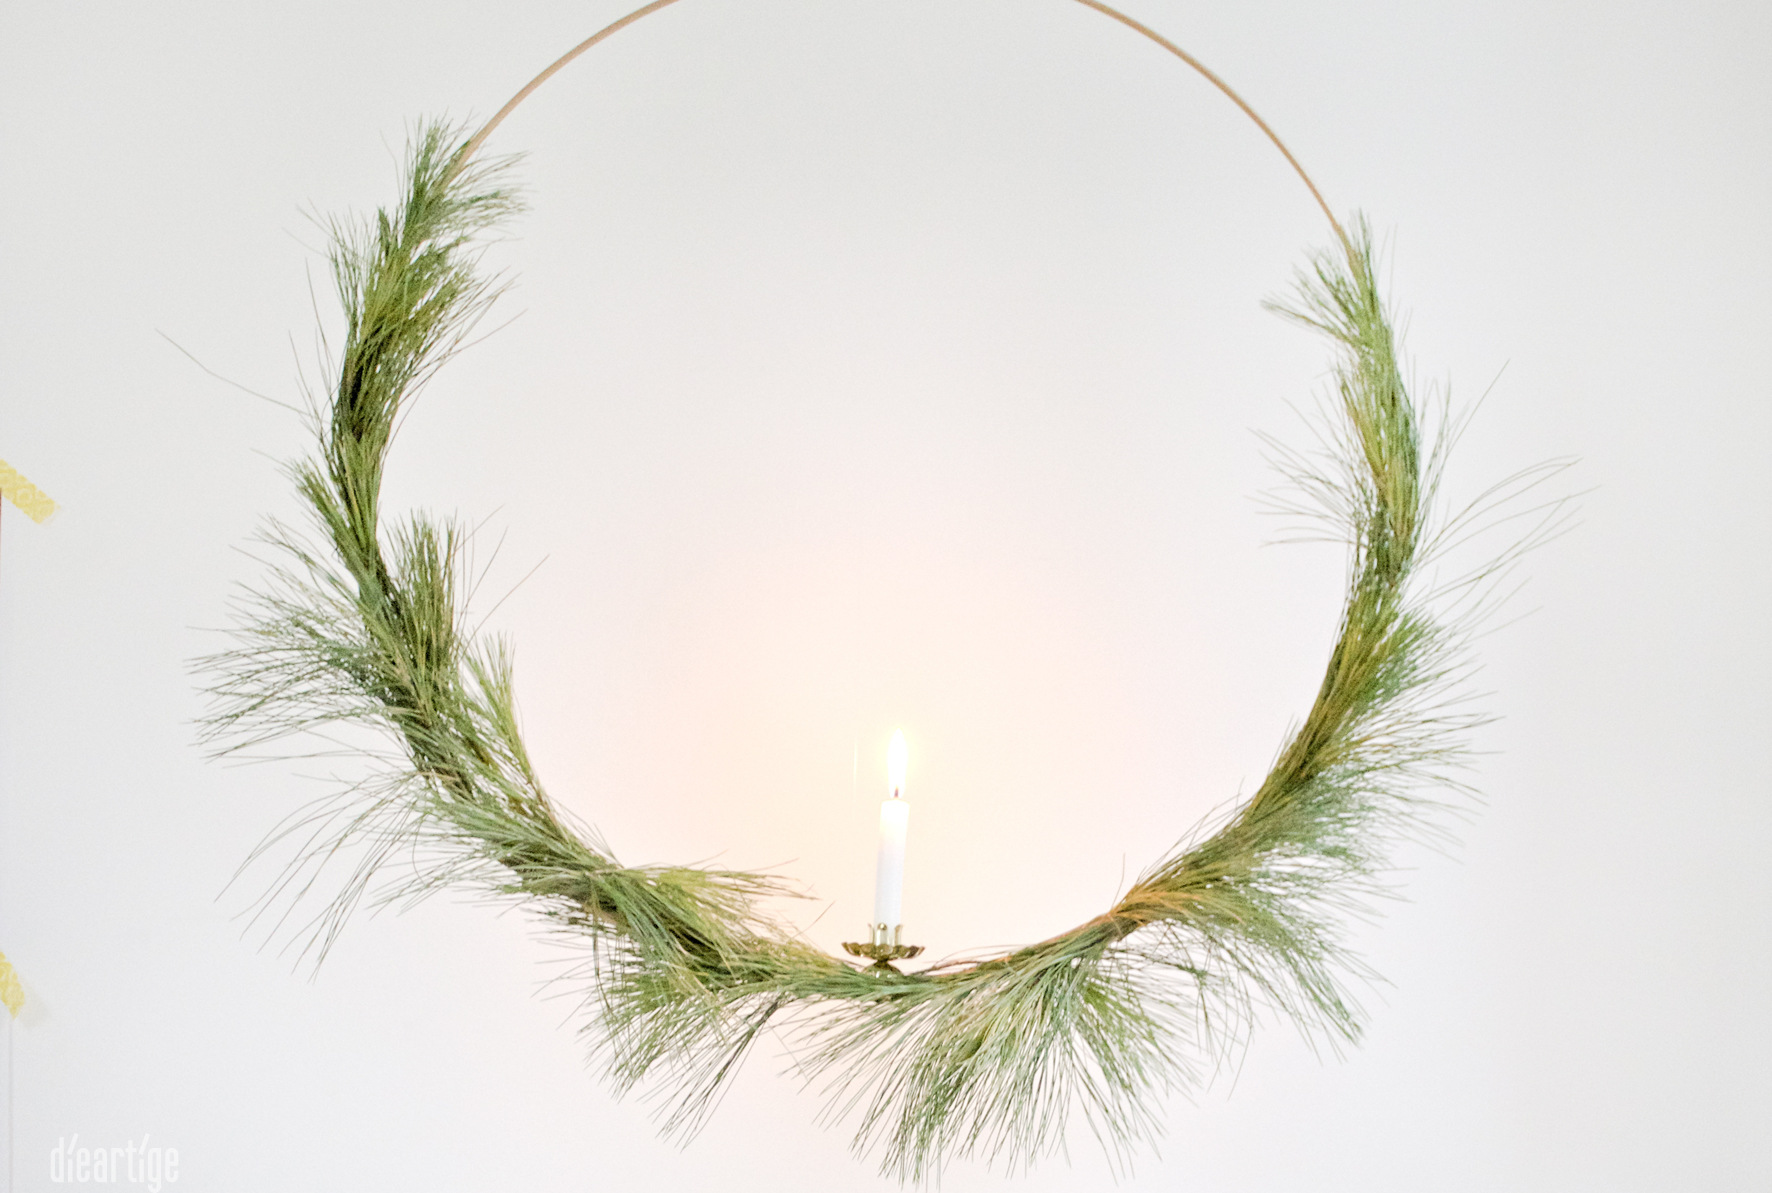 dieartigeBLOG - Kranz aus Seidenkiefer & Goldring + Kerze, Dekoidee Advent, Weihnachten, Winter